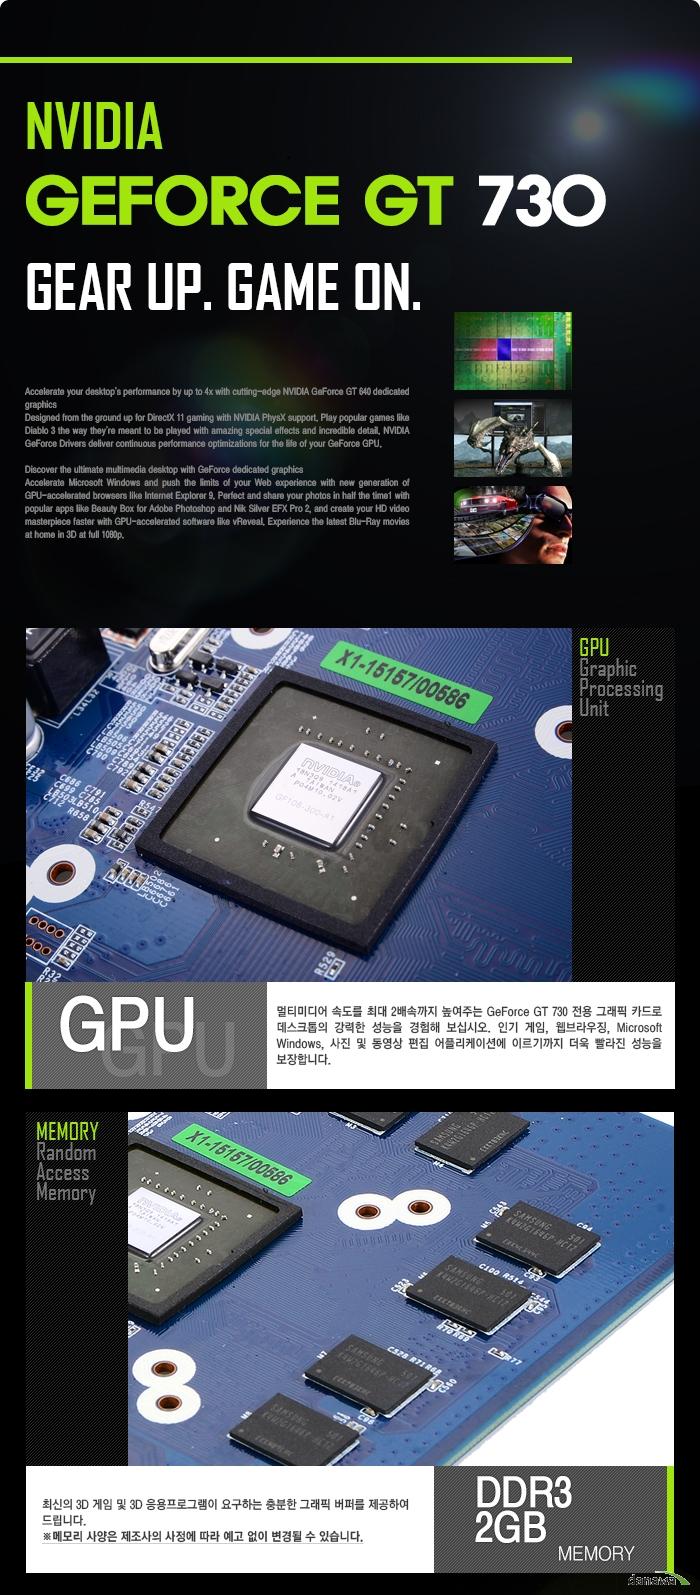 GALAX 지포스 GT730 D3 2GB 제품 기술설명